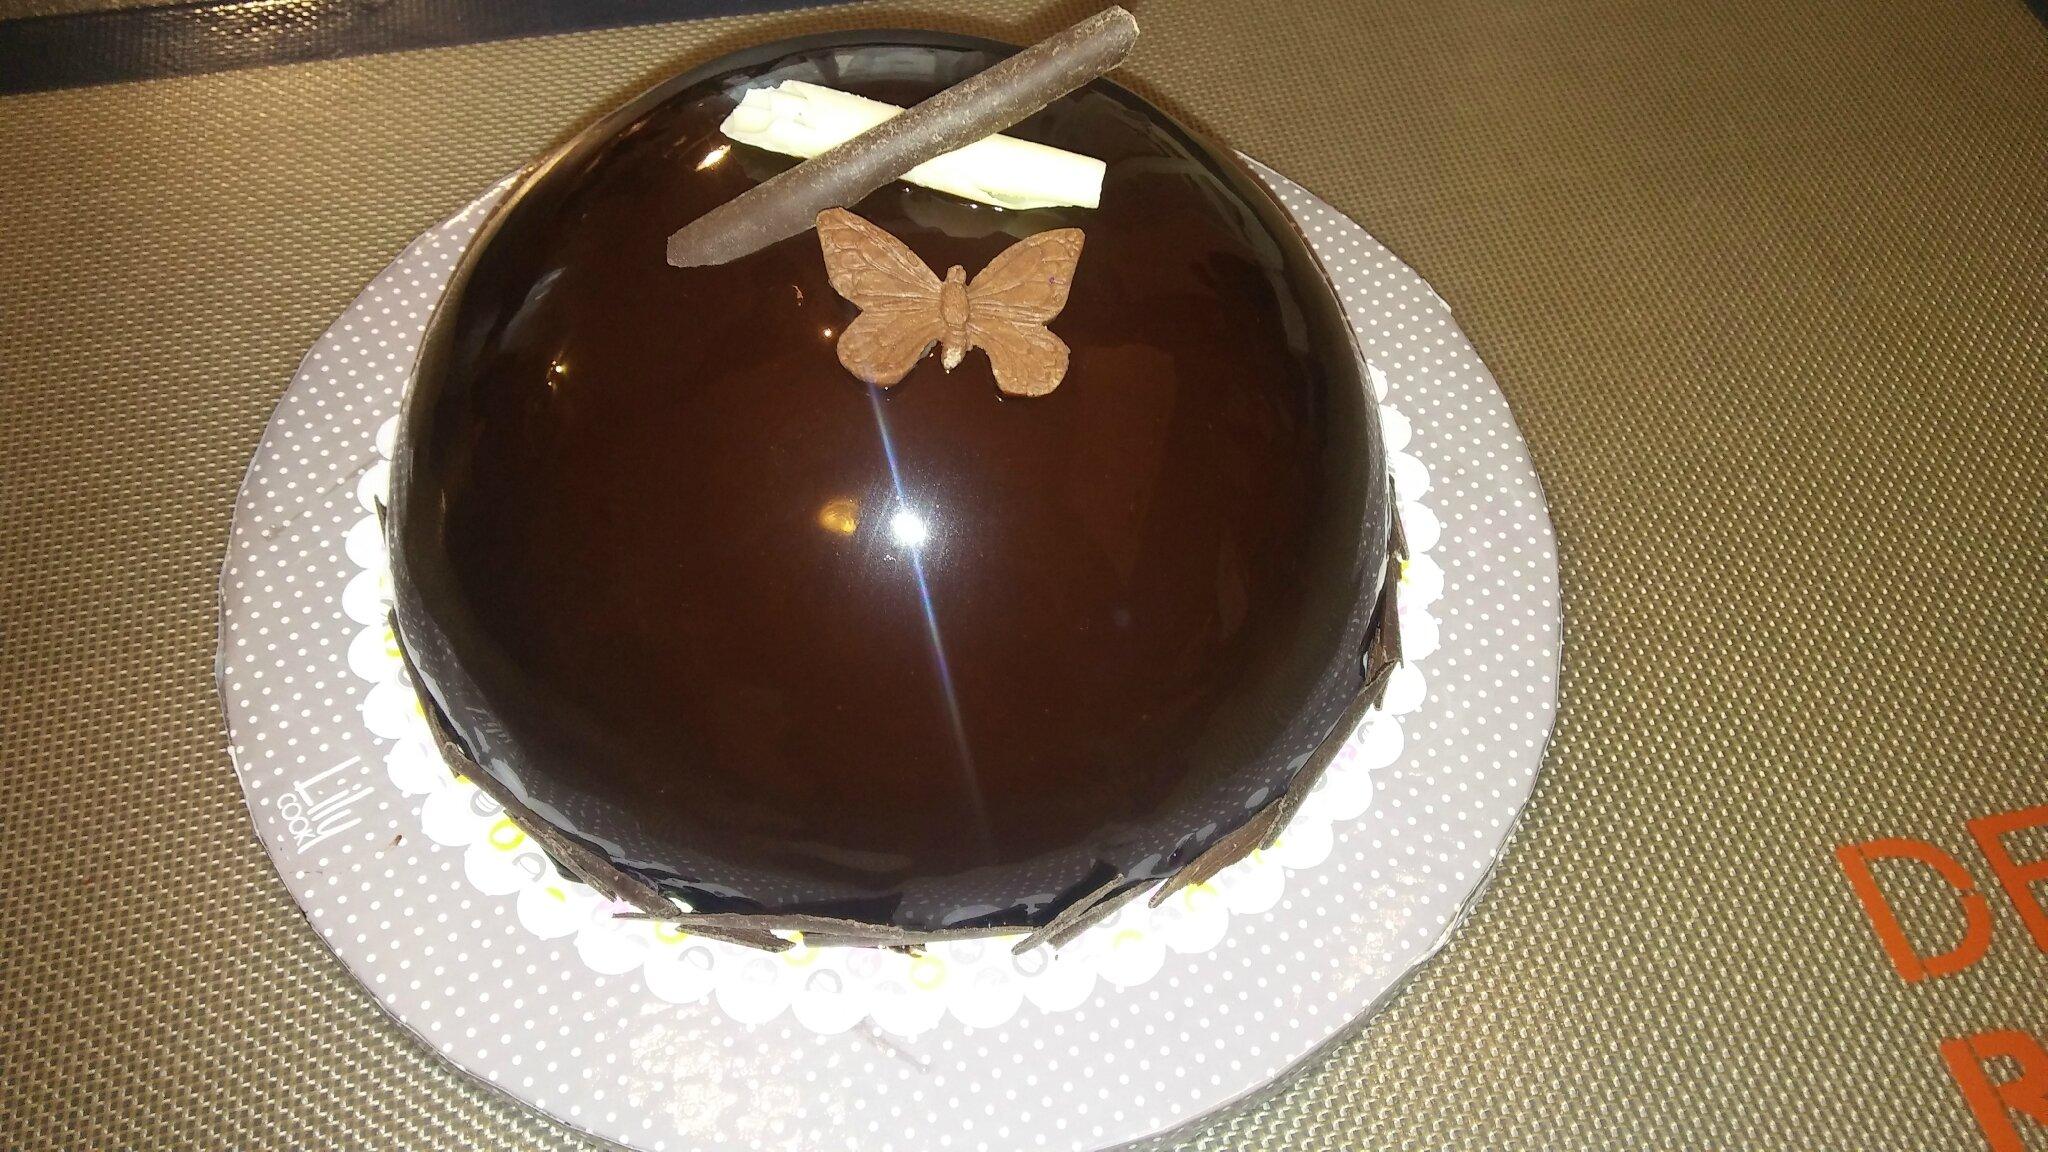 Dôme 3 chocolats Valrhona